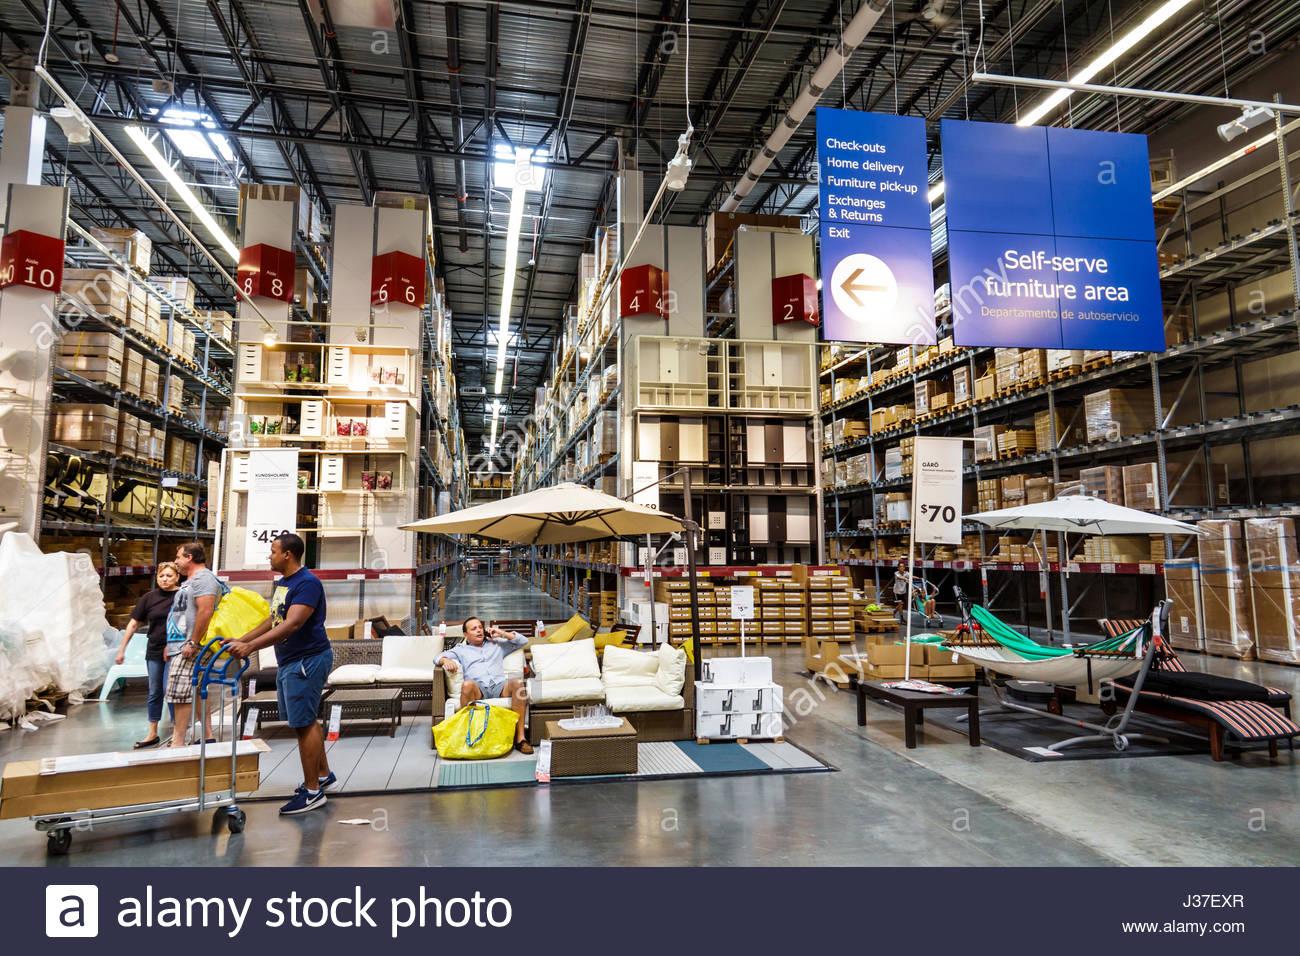 Miami Florida Ikea store retailer furniture home accessories